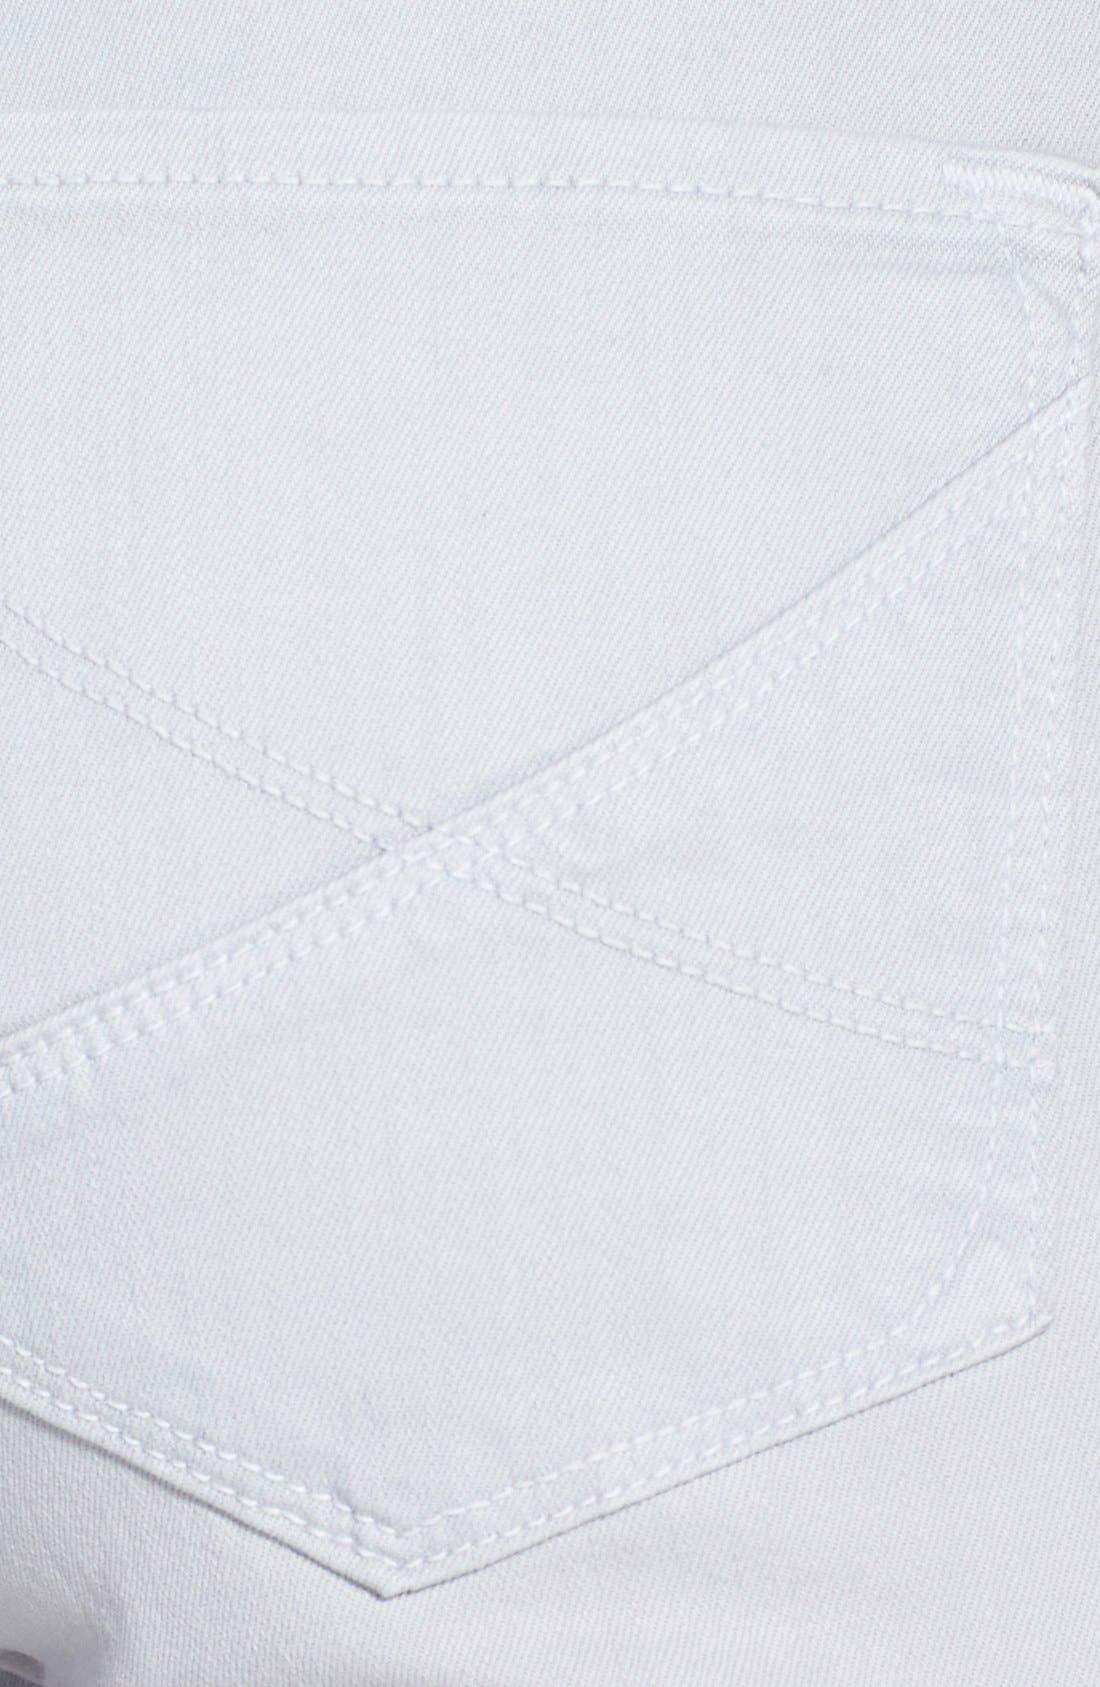 Alternate Image 3  - NYDJ 'Hayden' Stretch Cotton Crop Pants (Regular & Petite)